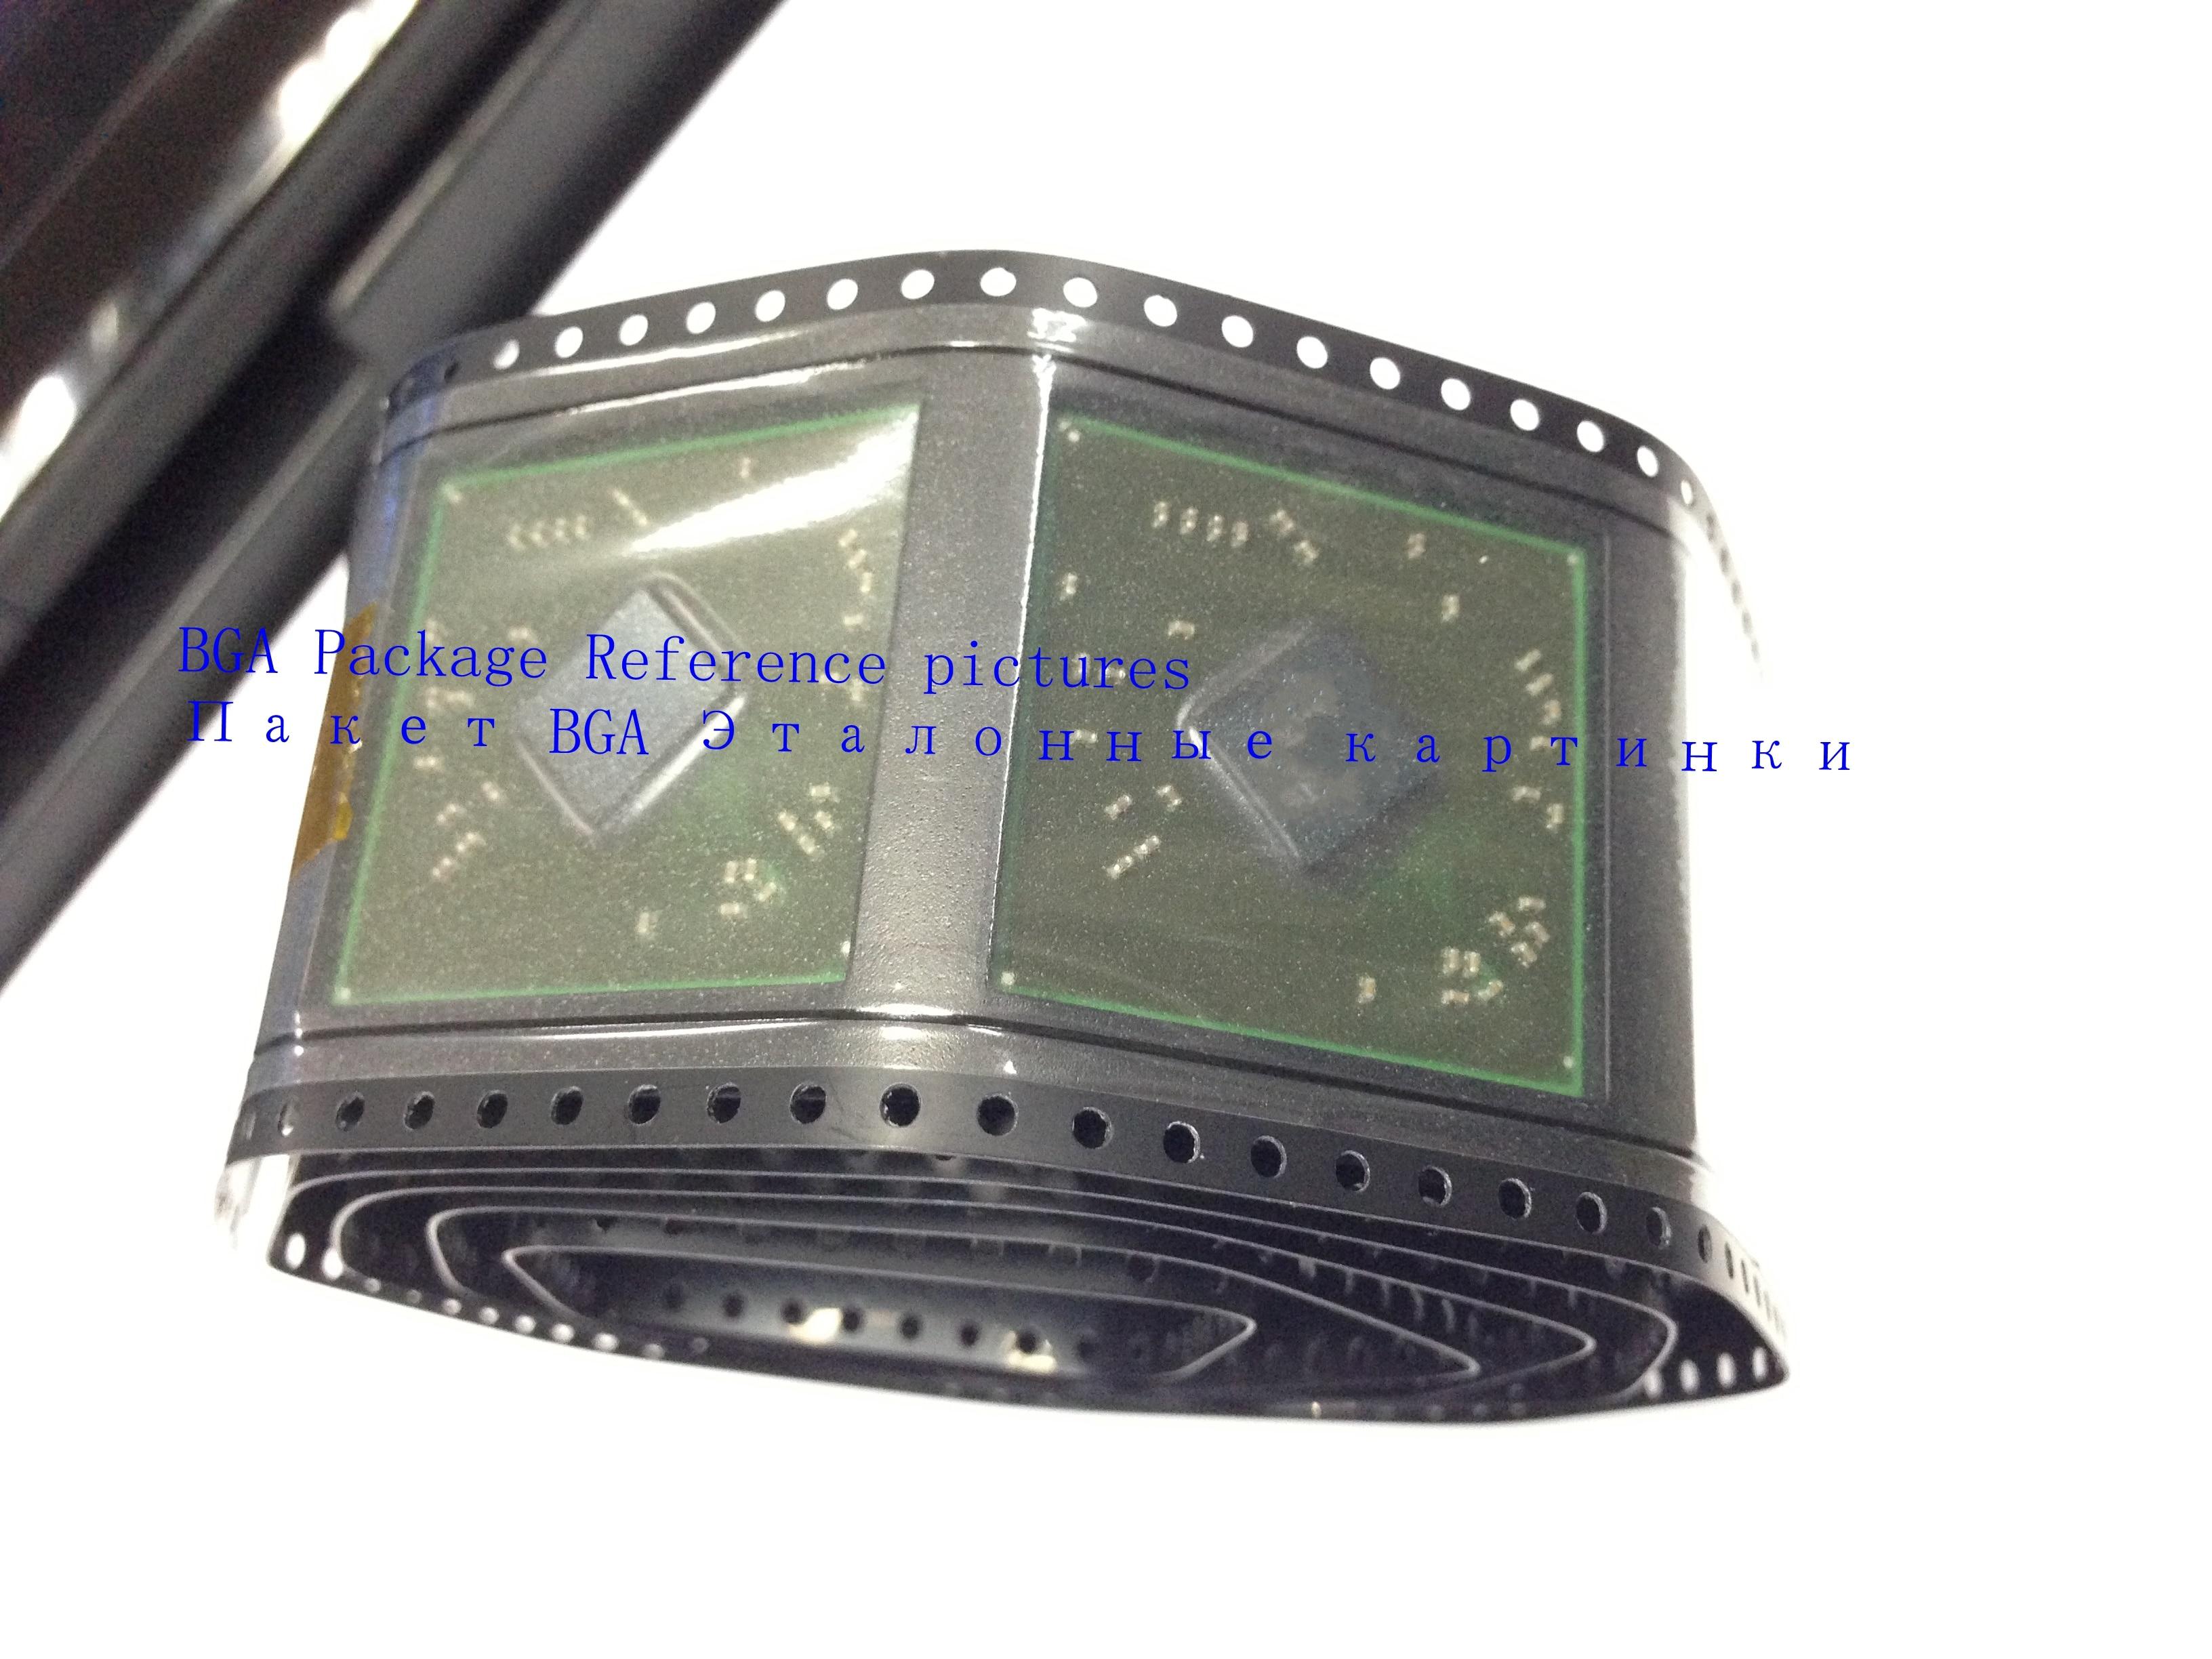 1pcs/lot 100% New N13P-LP-A2 N13P LP A2 BGA Chipset1pcs/lot 100% New N13P-LP-A2 N13P LP A2 BGA Chipset